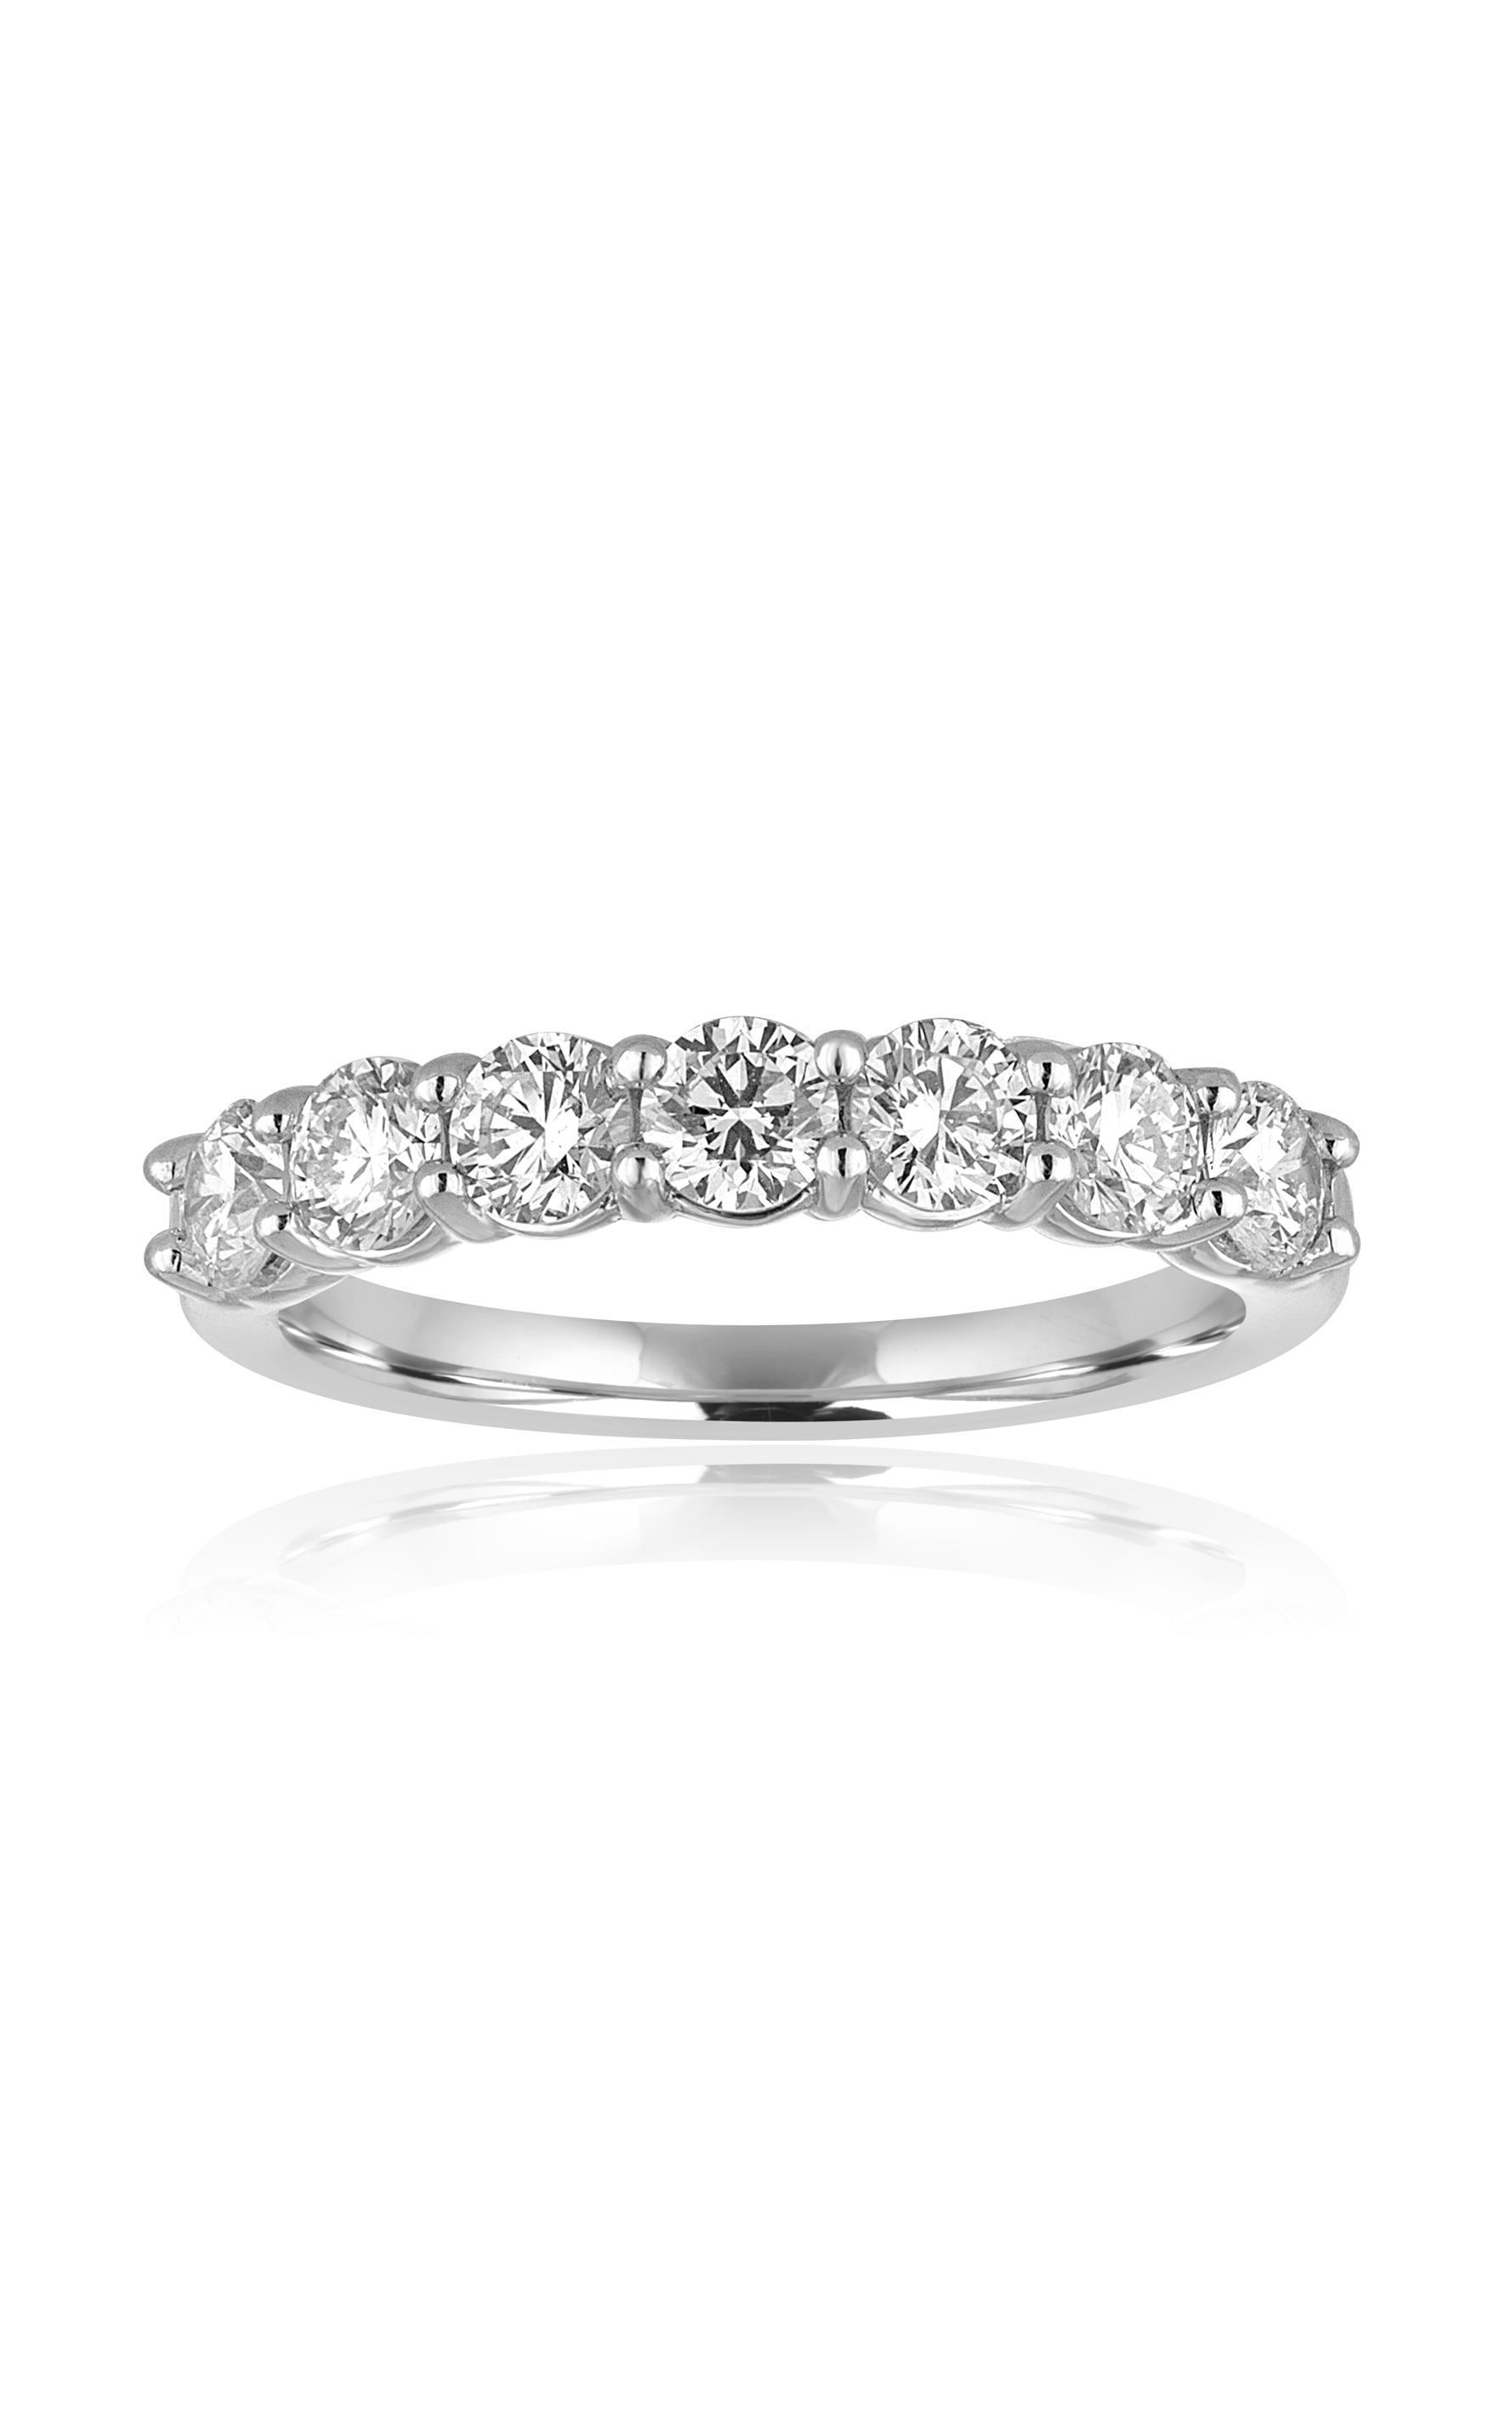 Imagine Bridal Fashion Rings 76076D-1 2 product image